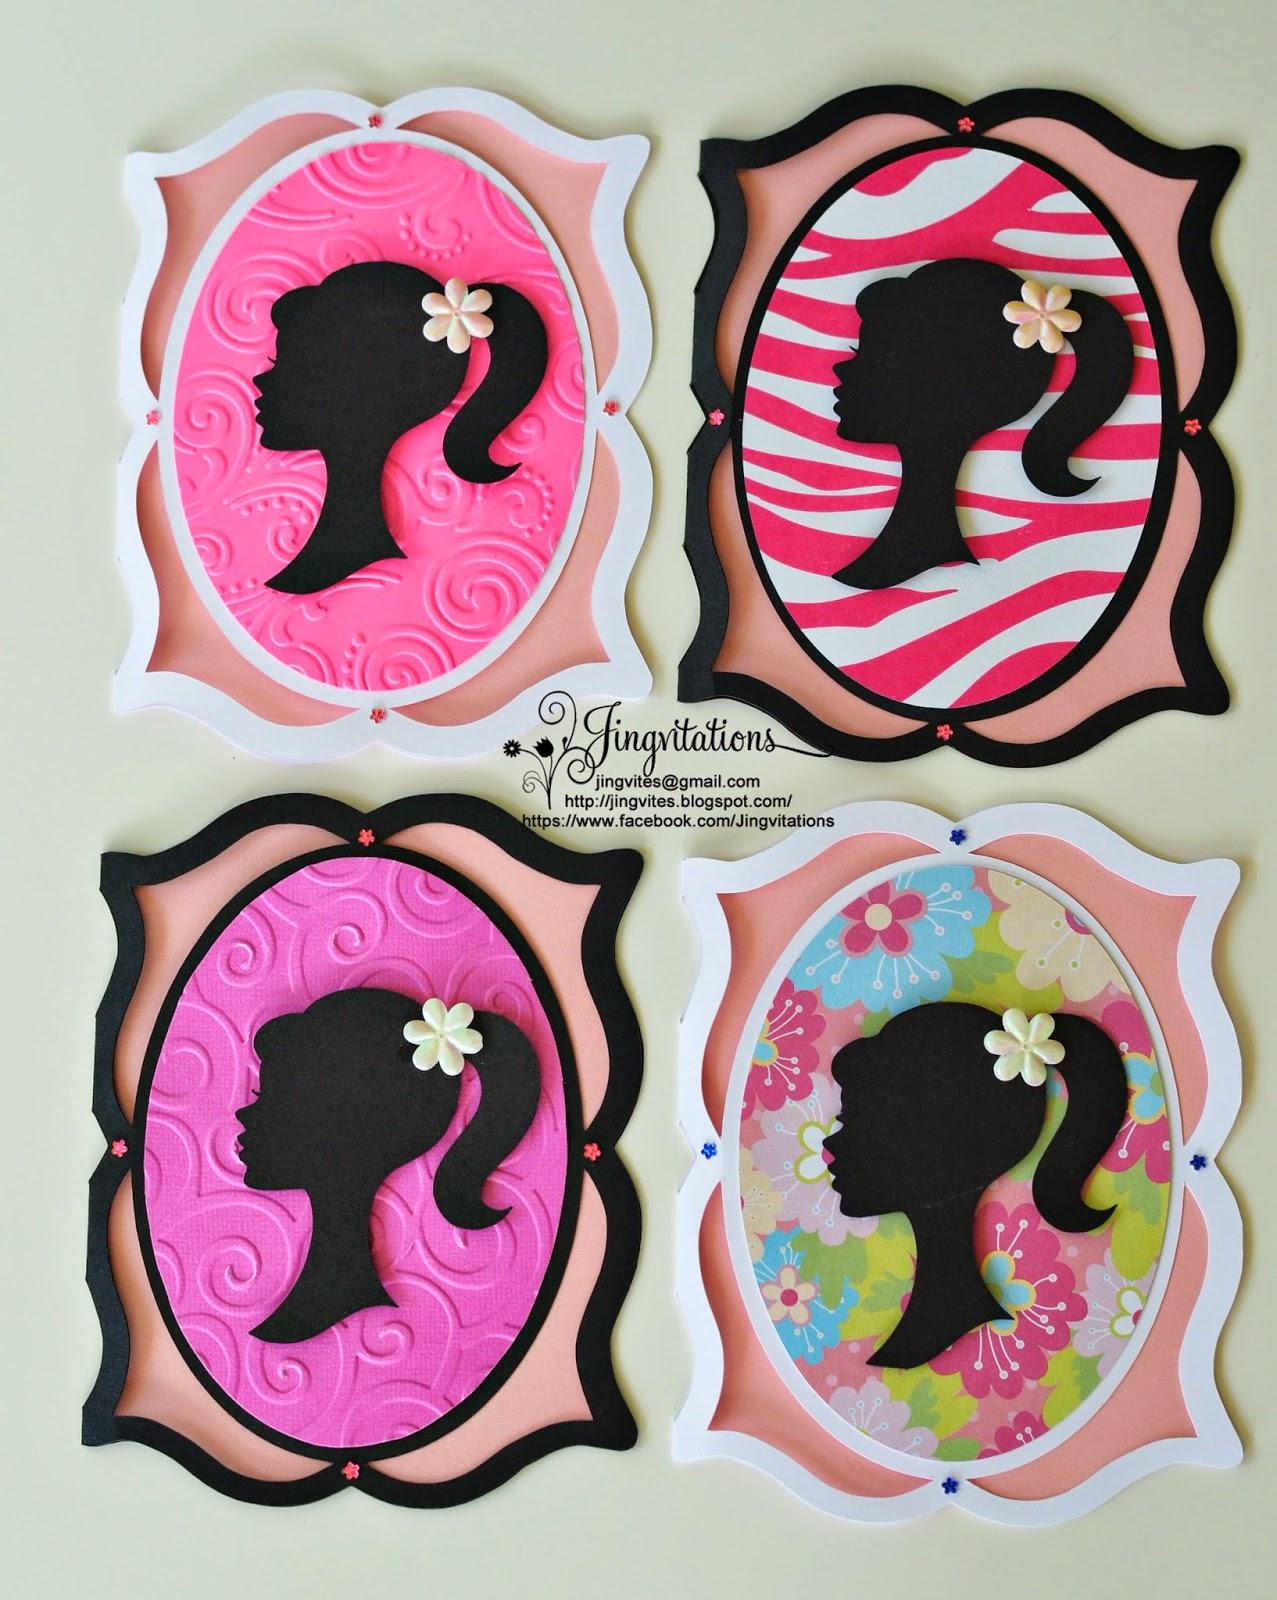 Jingvitations Silhouette Cameo Barbie Cricut Frame Birthday Invitations